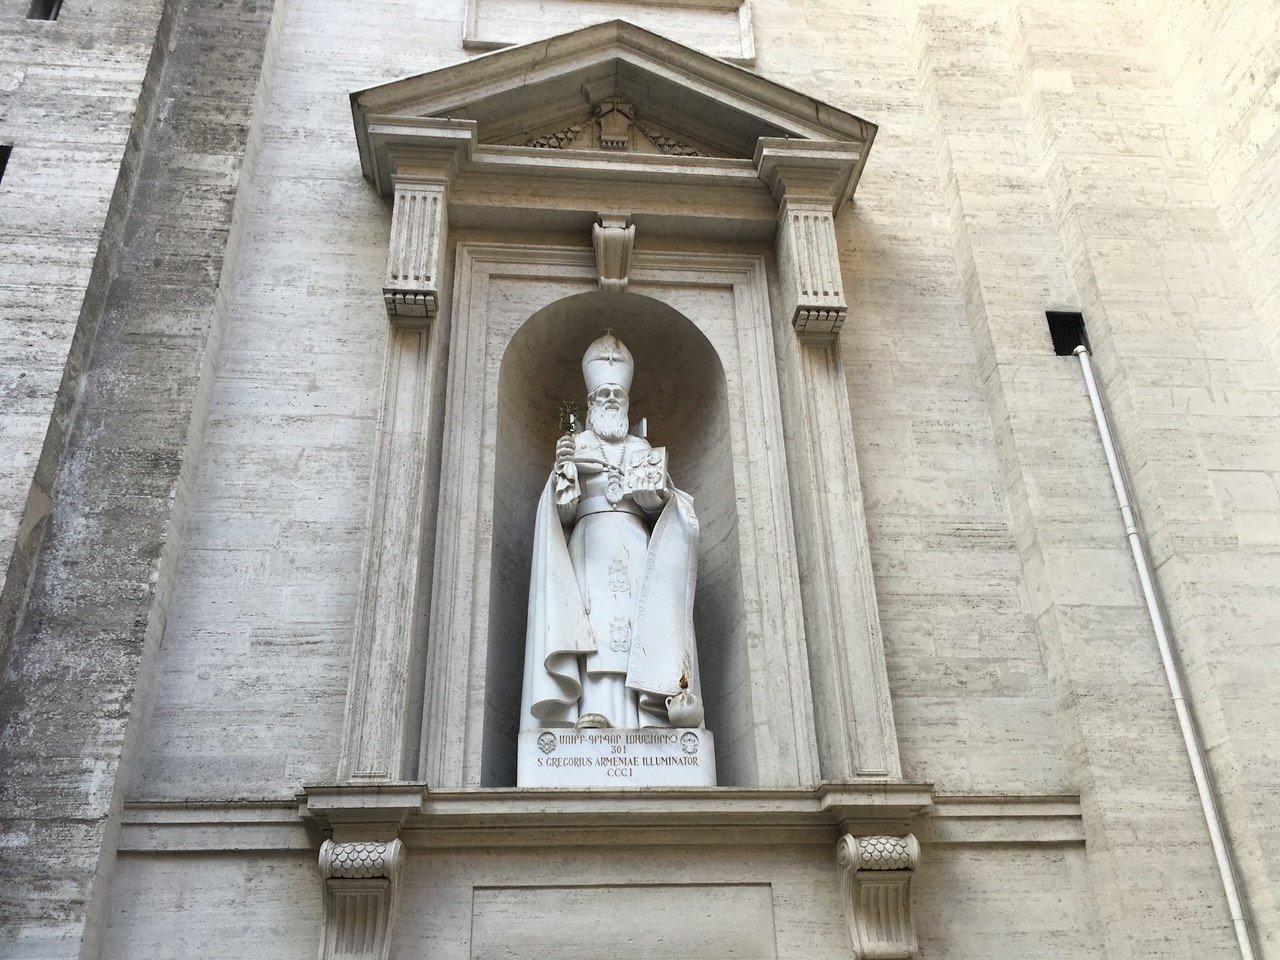 A statue of St. Gregorius at Vatican City